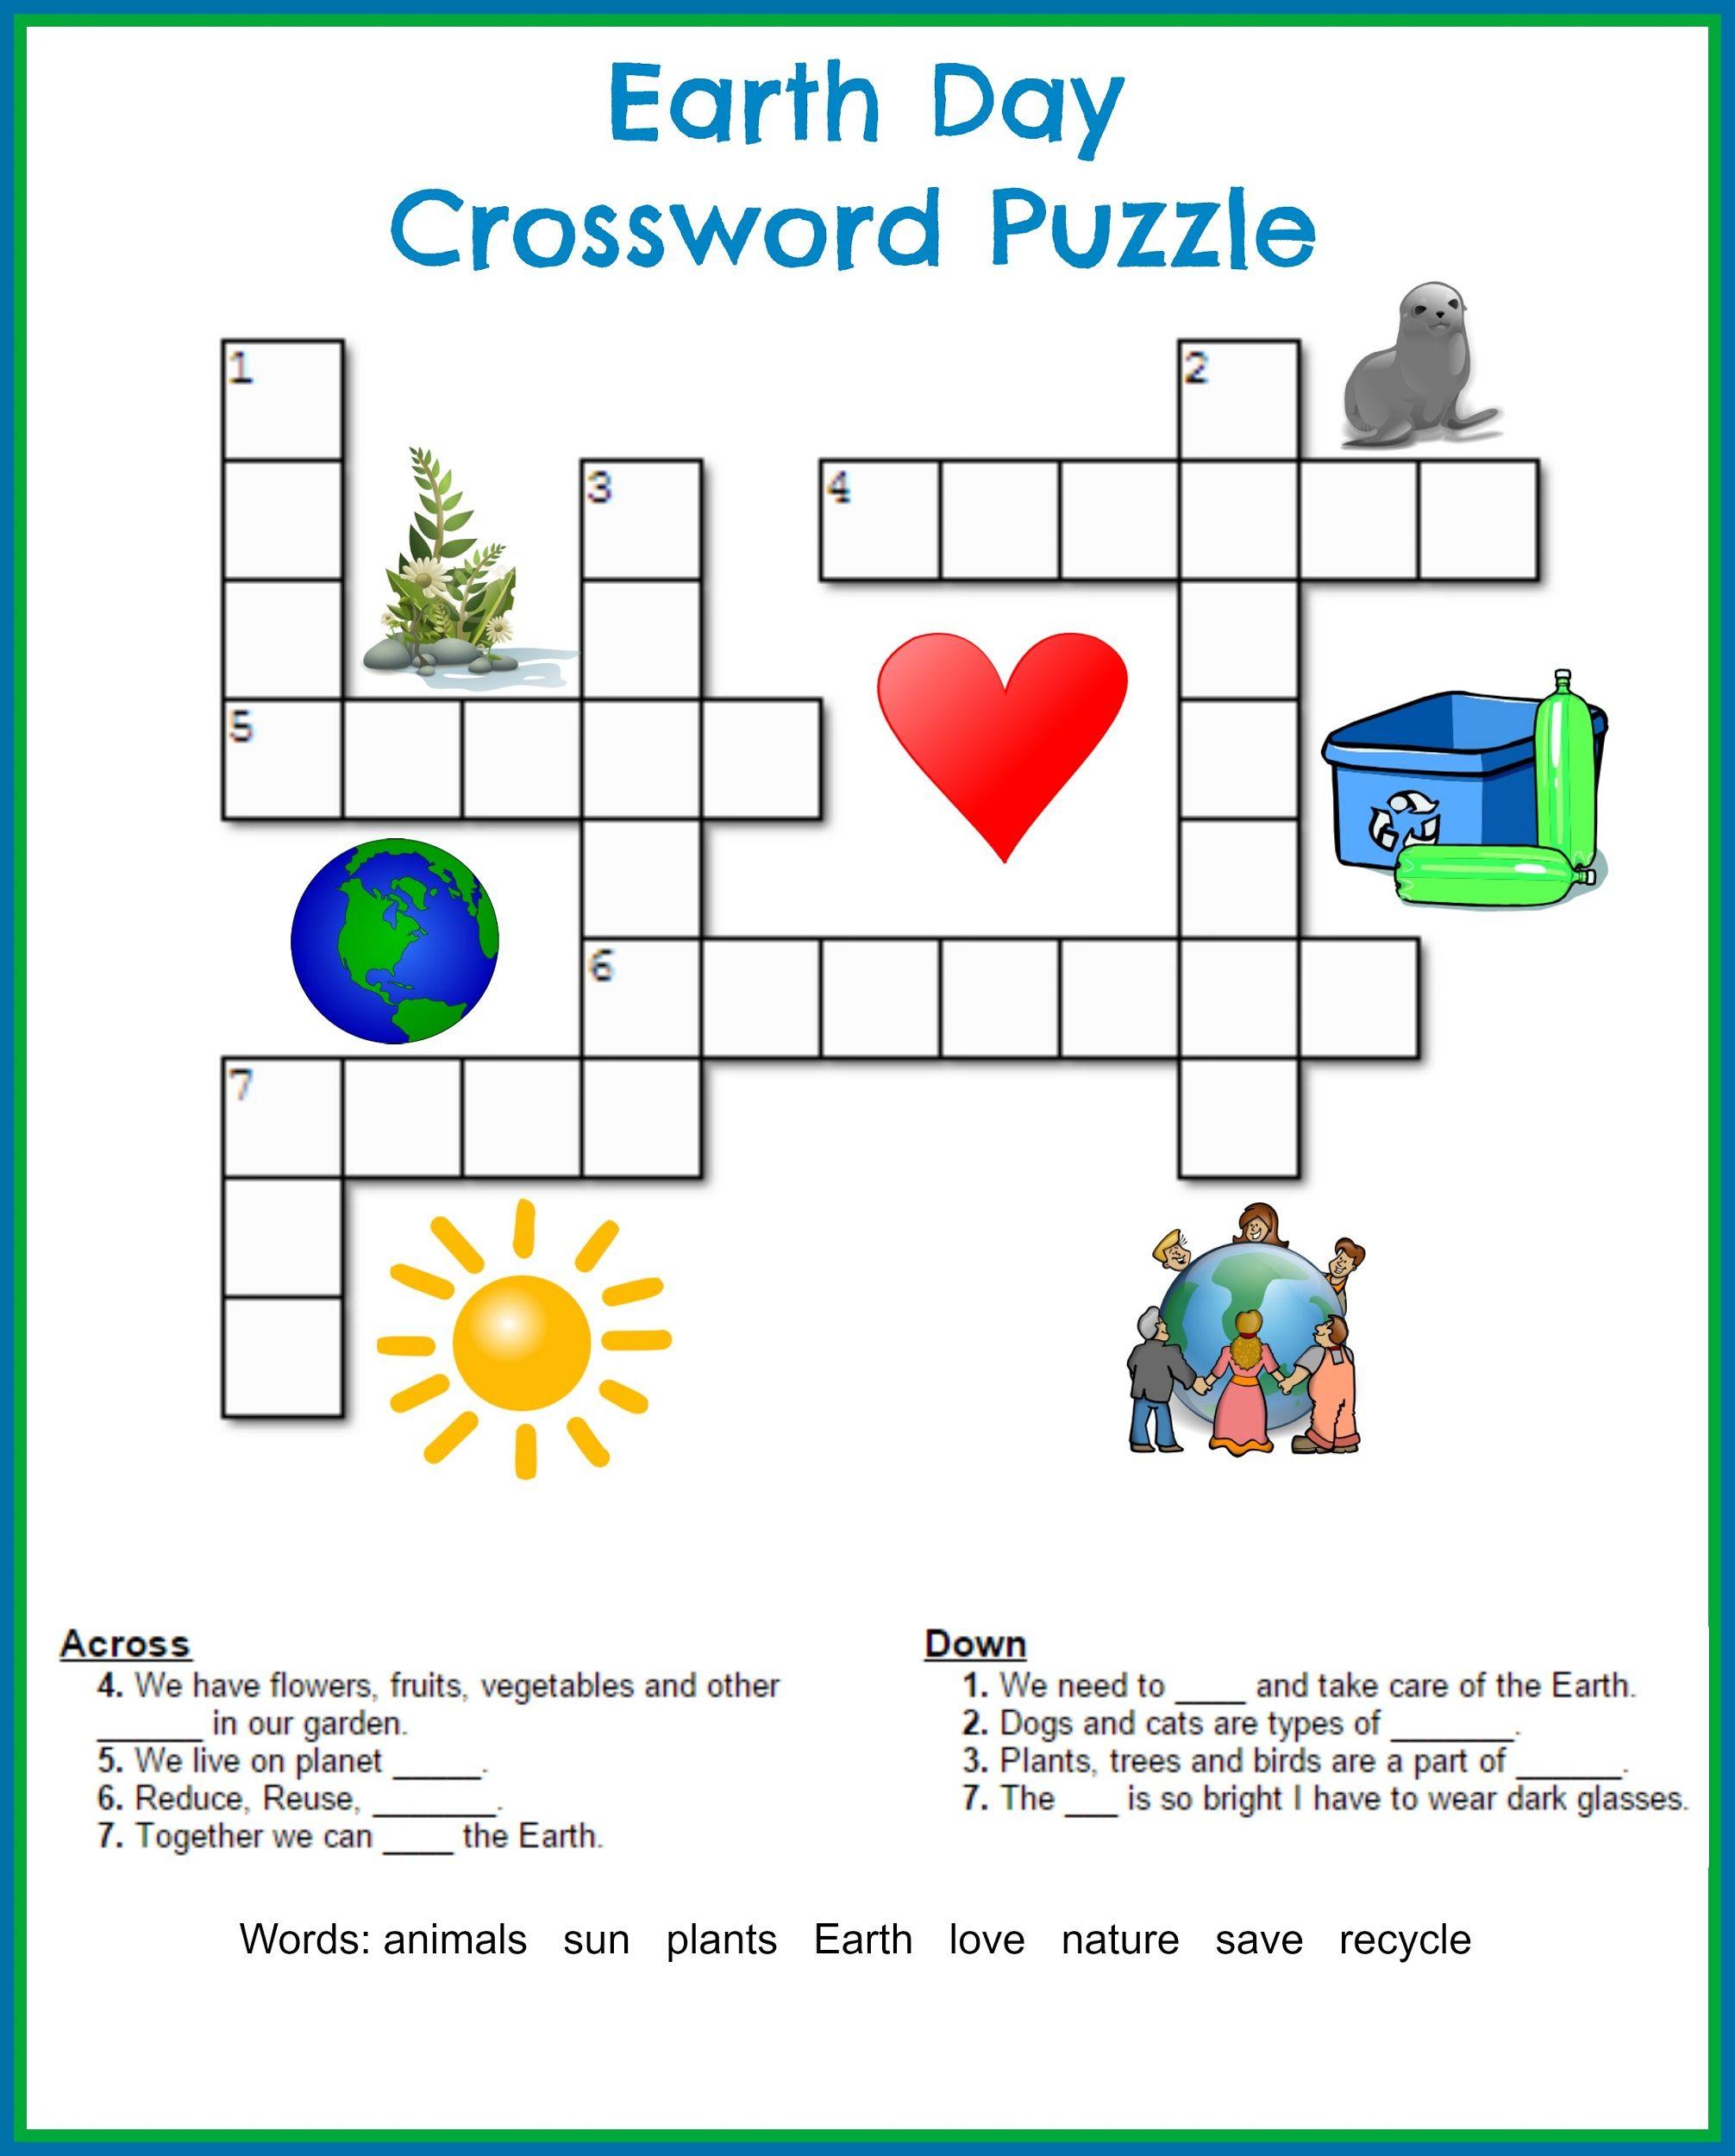 Printable Crossword Puzzles Kids | Crossword Puzzles On Earth - Printable Crossword Puzzle Of The Day